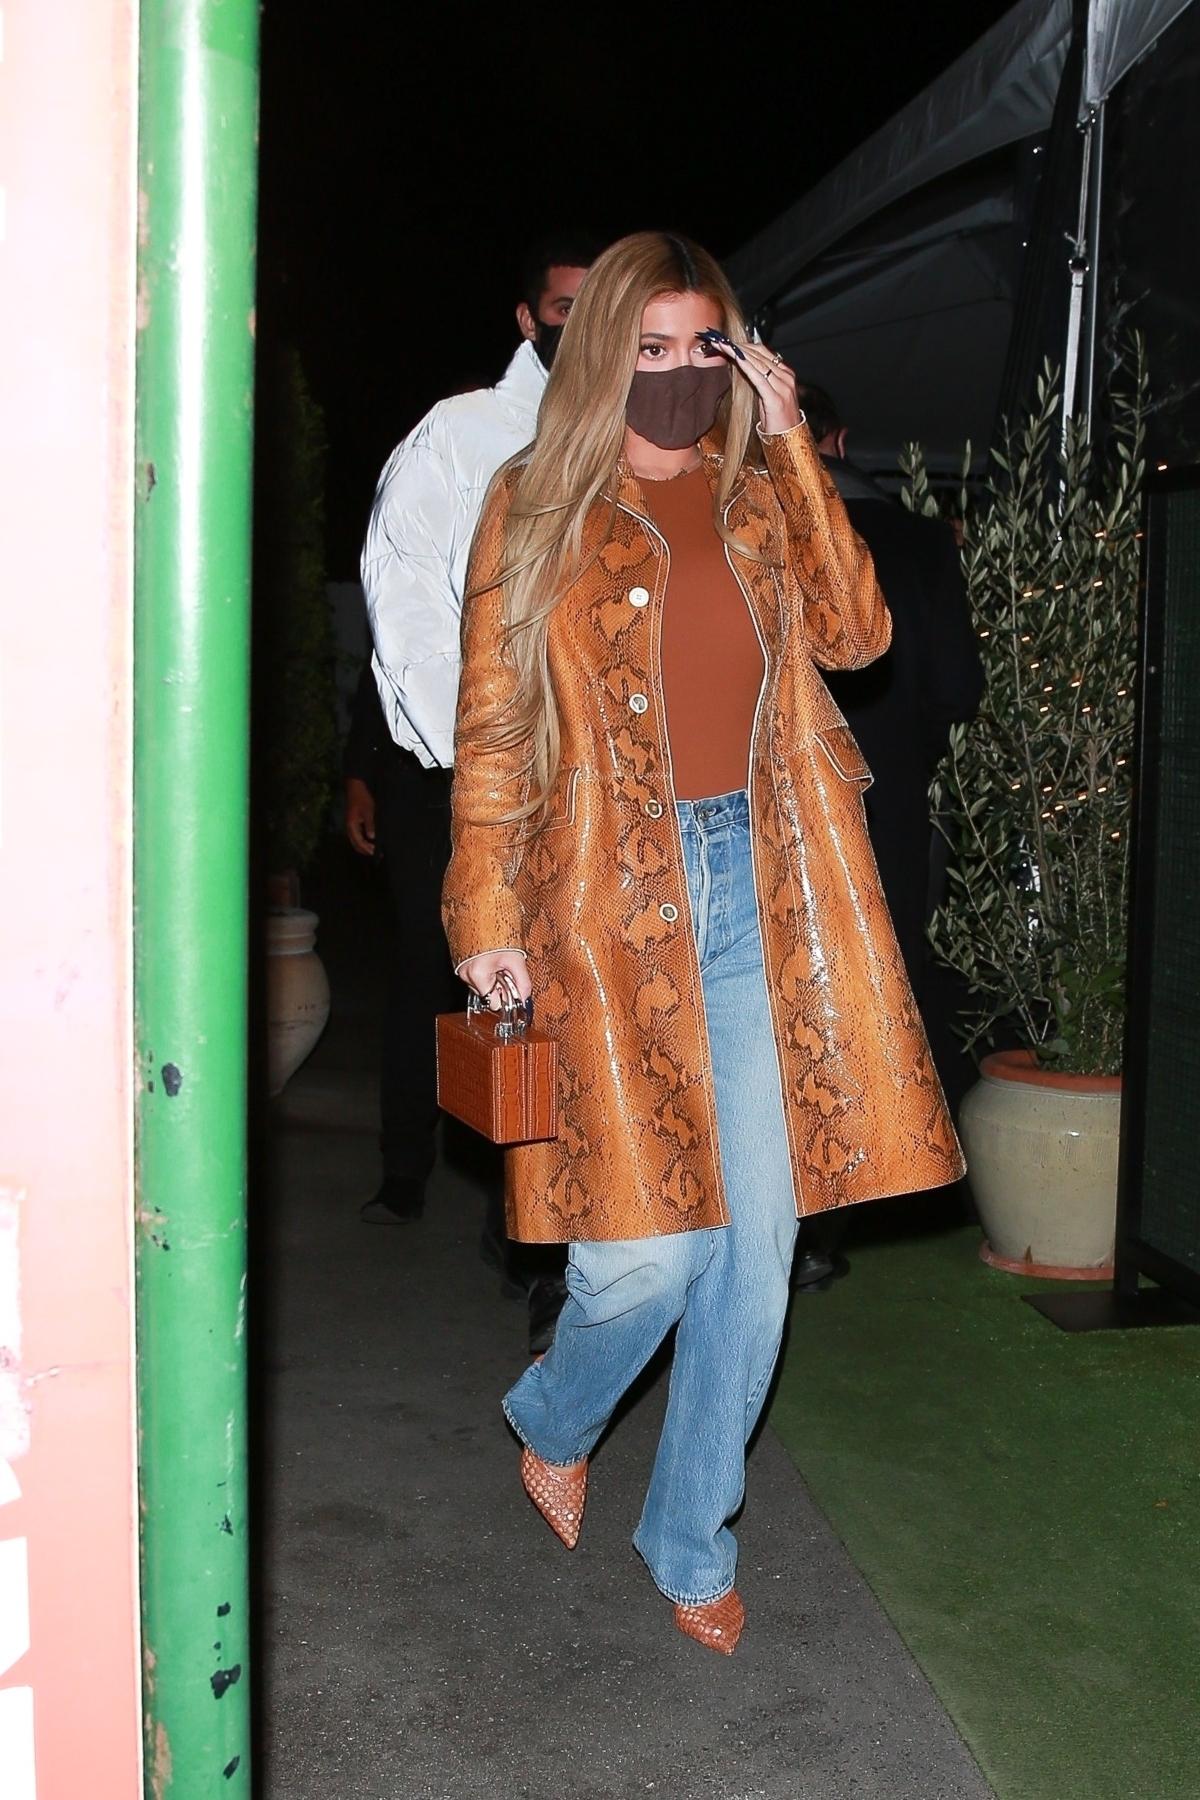 Kylie Jenner in snakeskin jacket in Santa Monica